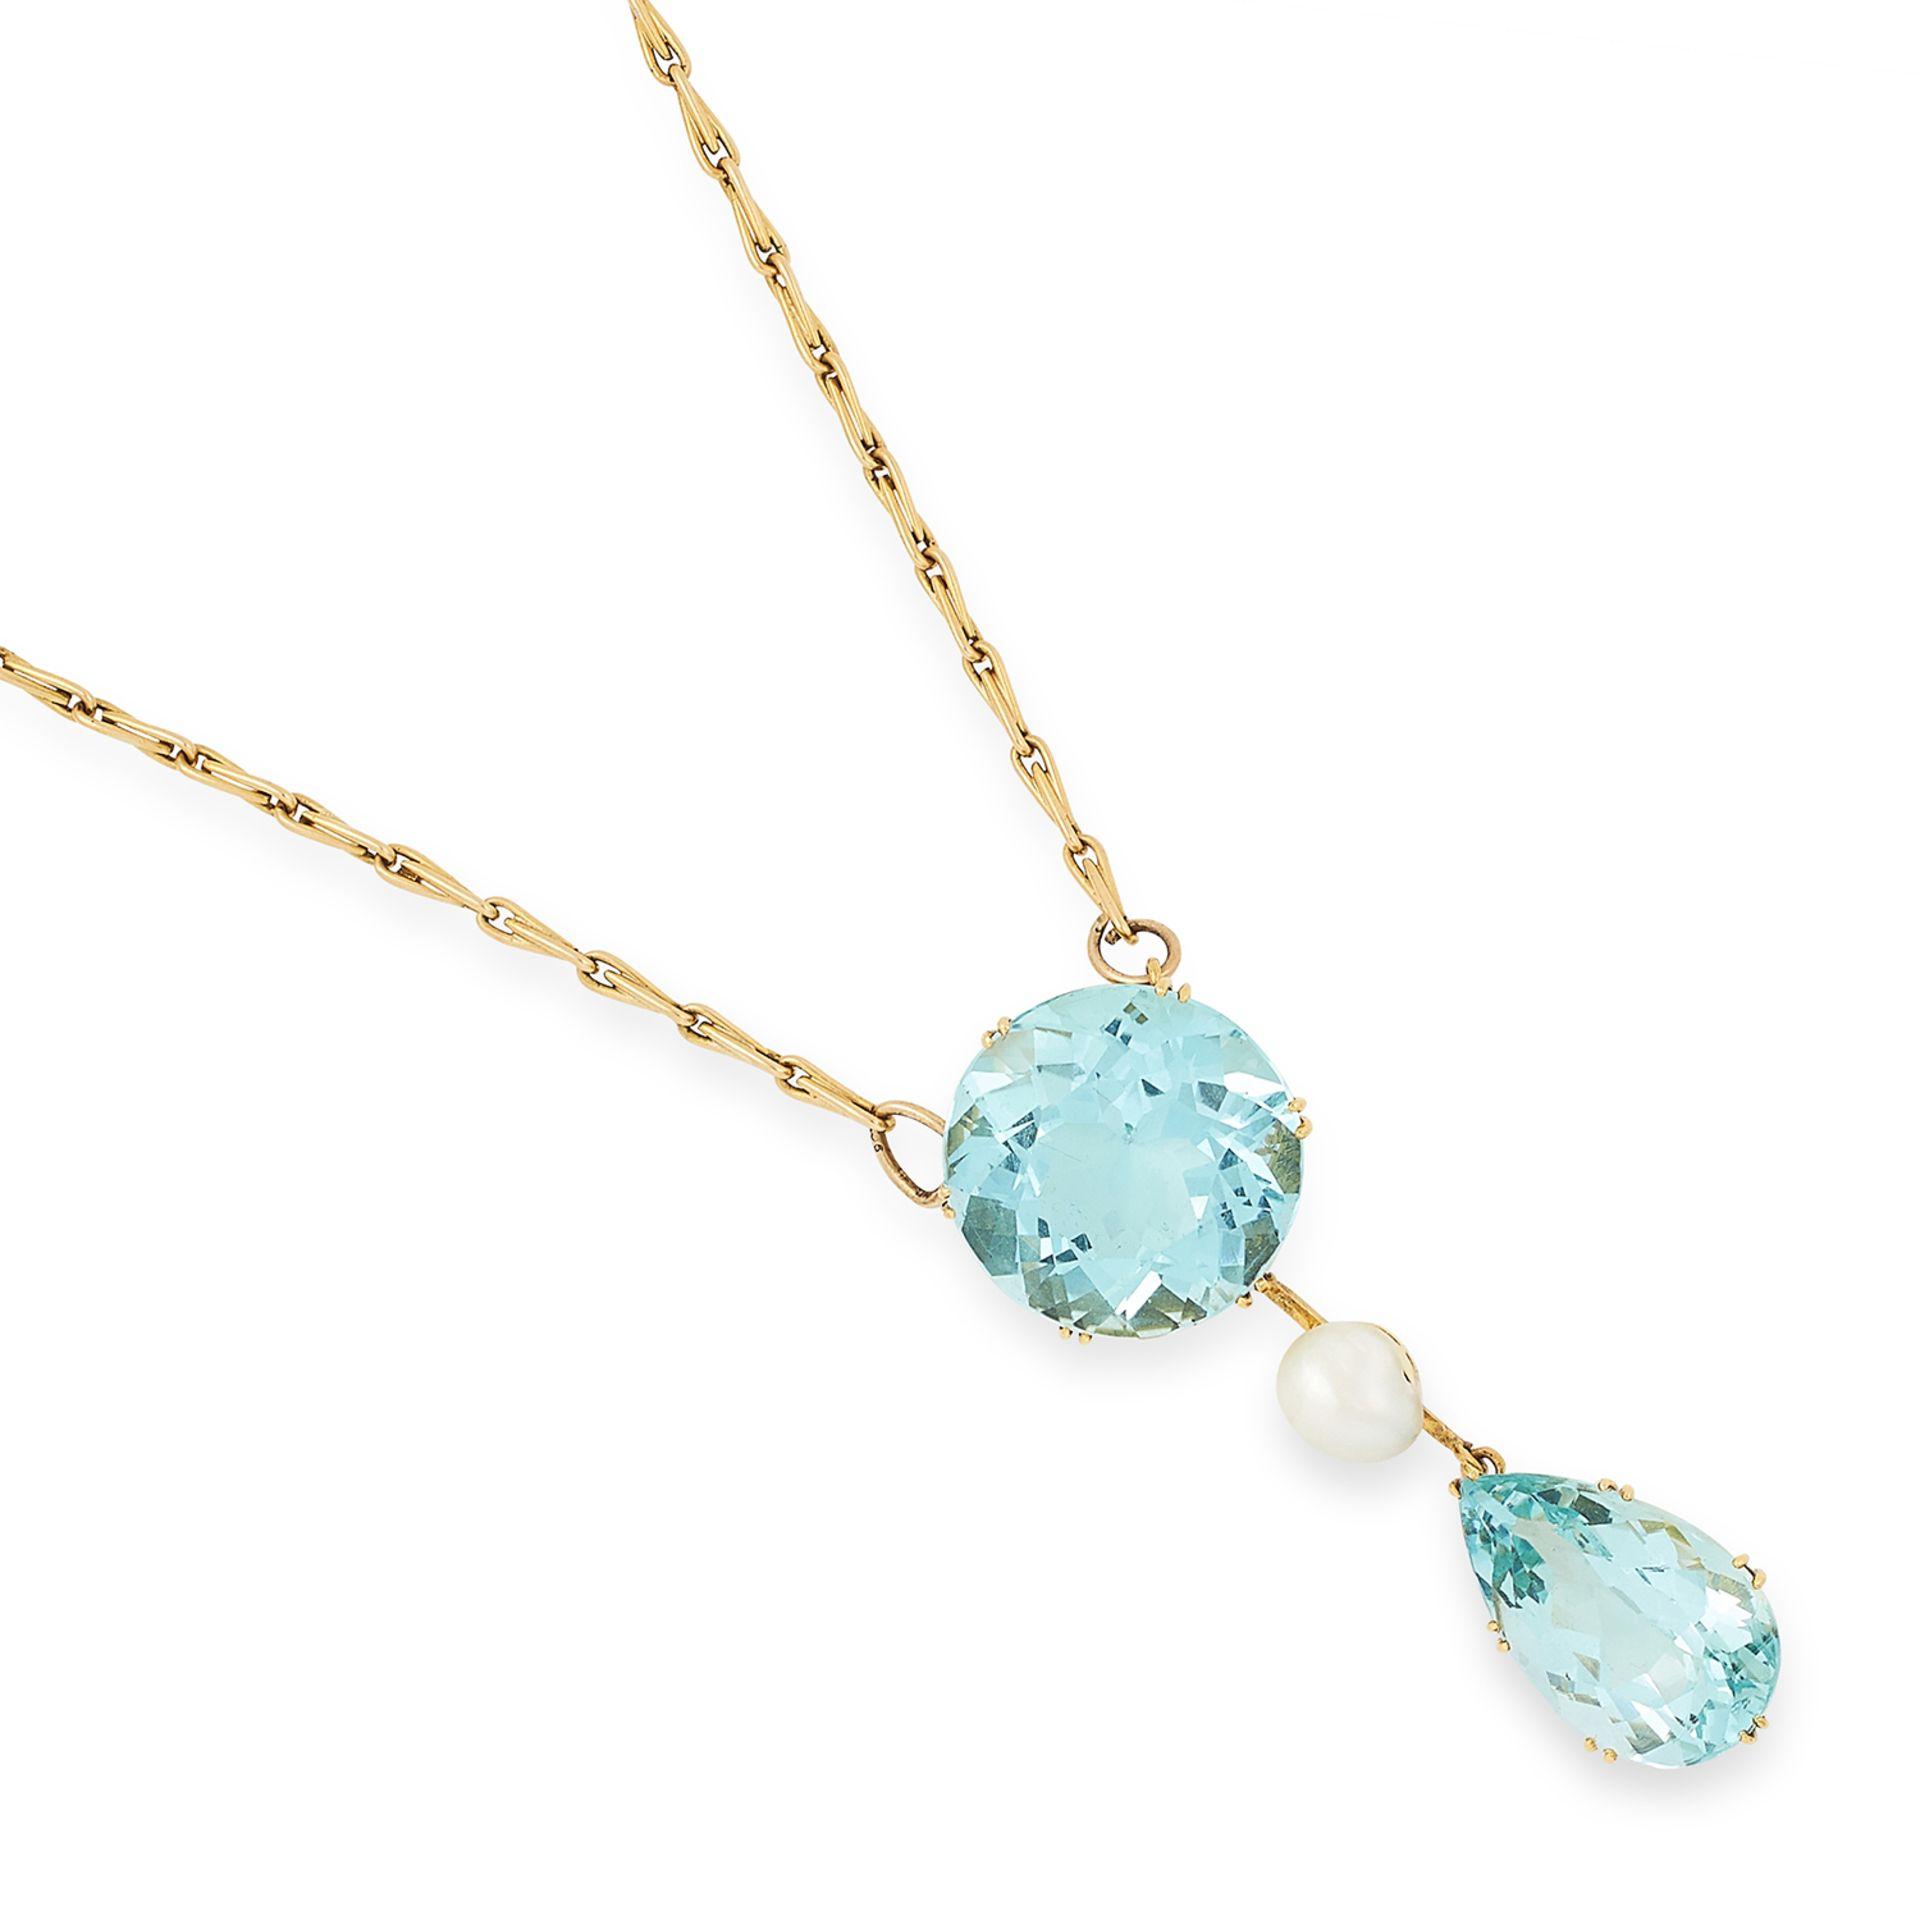 VINTAGE AQUAMARINE AND PEARL PENDANT comprising of a round cut aquamarine suspending a pearl and